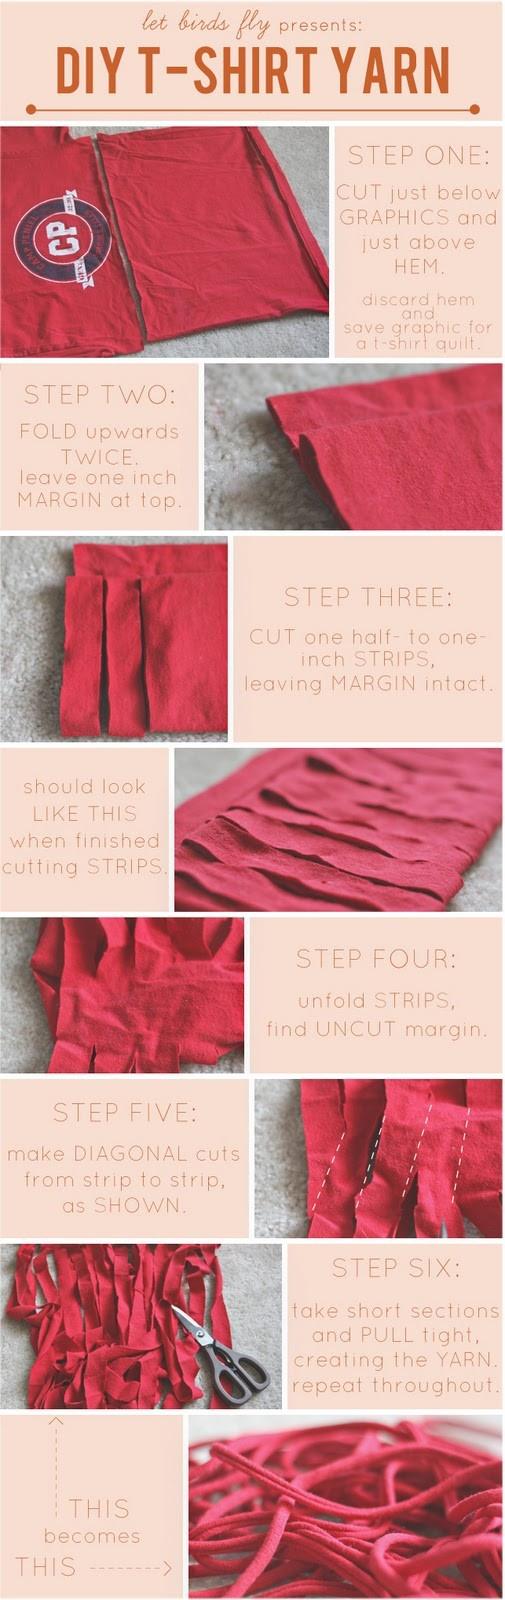 DIY T-shirt yarn @ Do It Yourself Pins